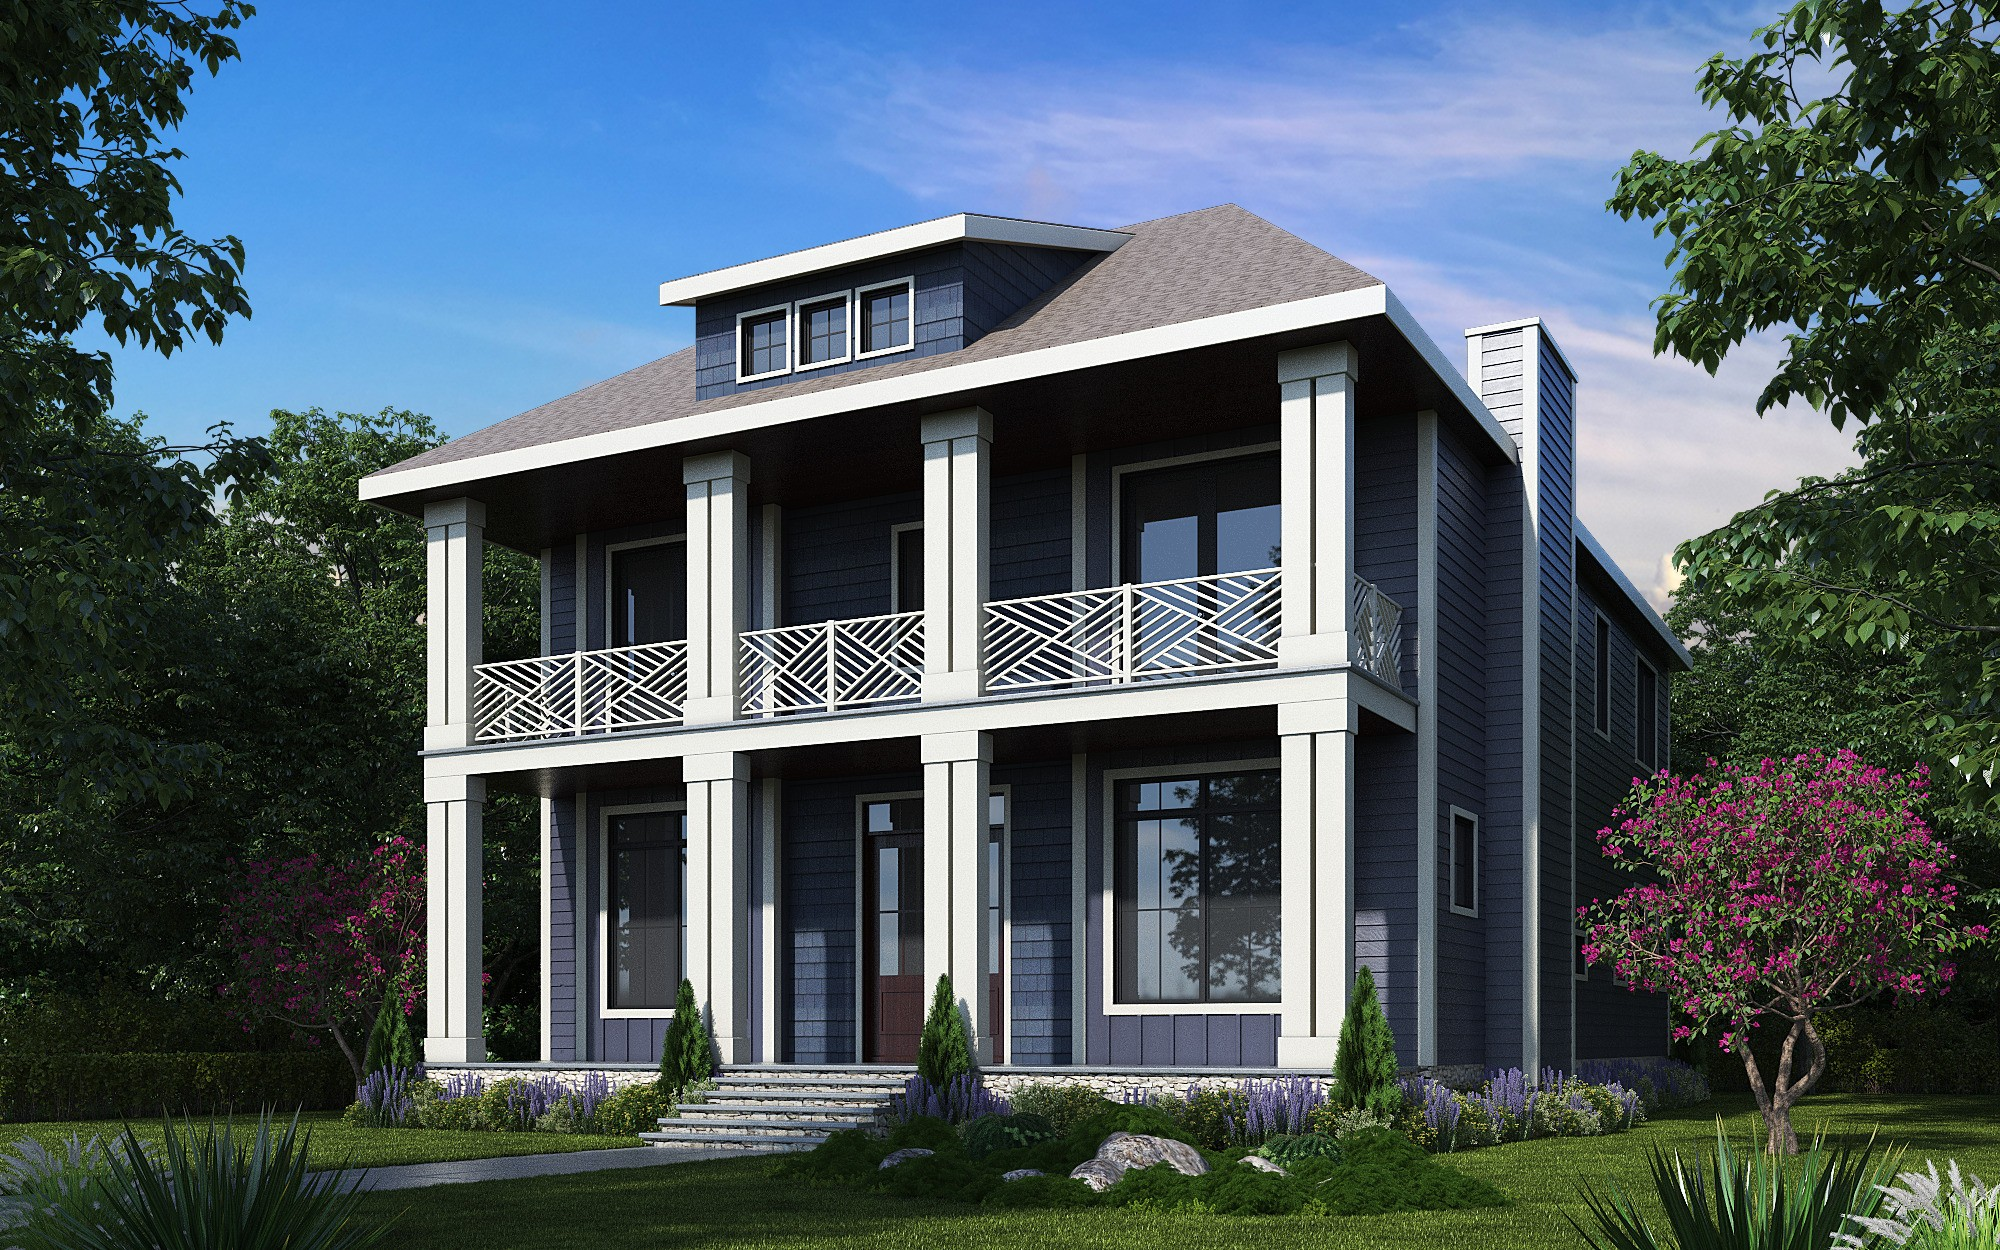 4013 Nebraska Ave Property Photo - Nashville, TN real estate listing